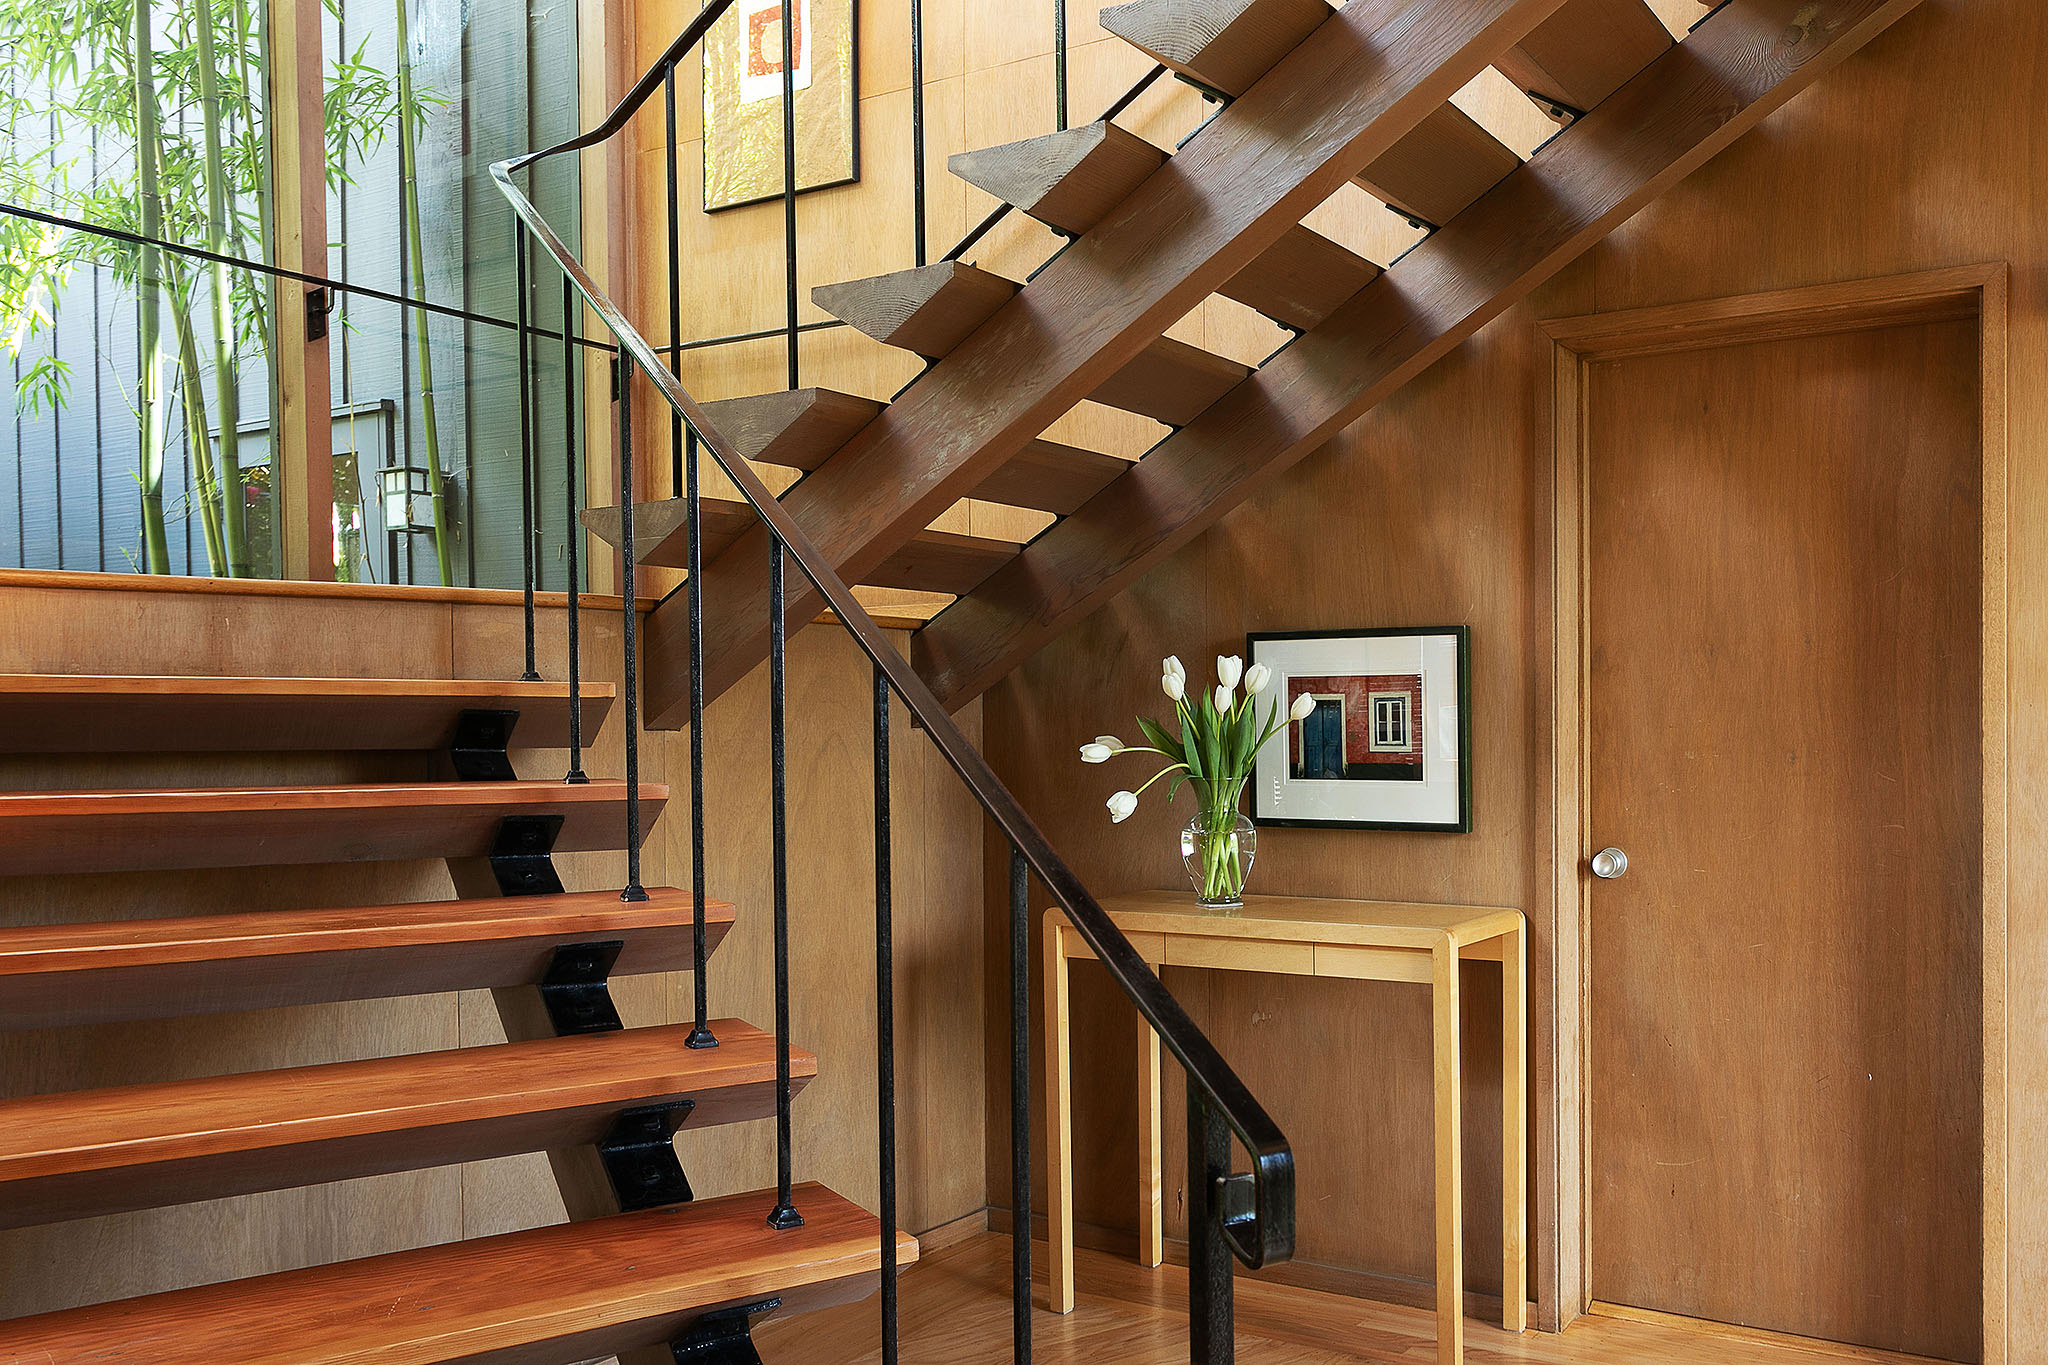 07 Staircase detail.jpg